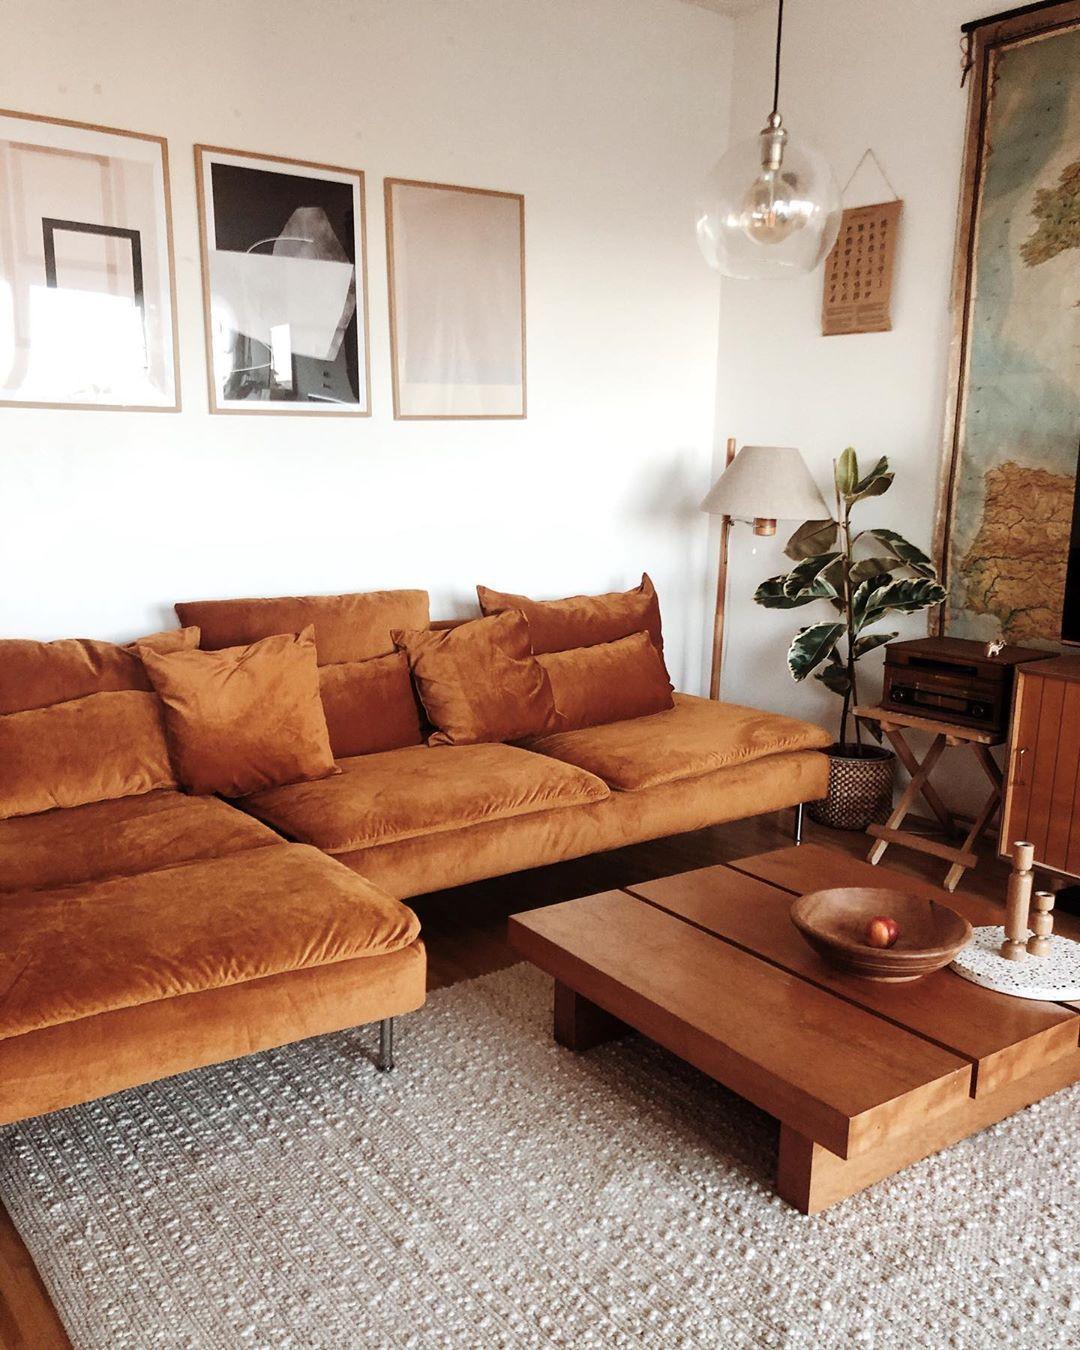 salon interior design pictures #salon interior design app #jawed